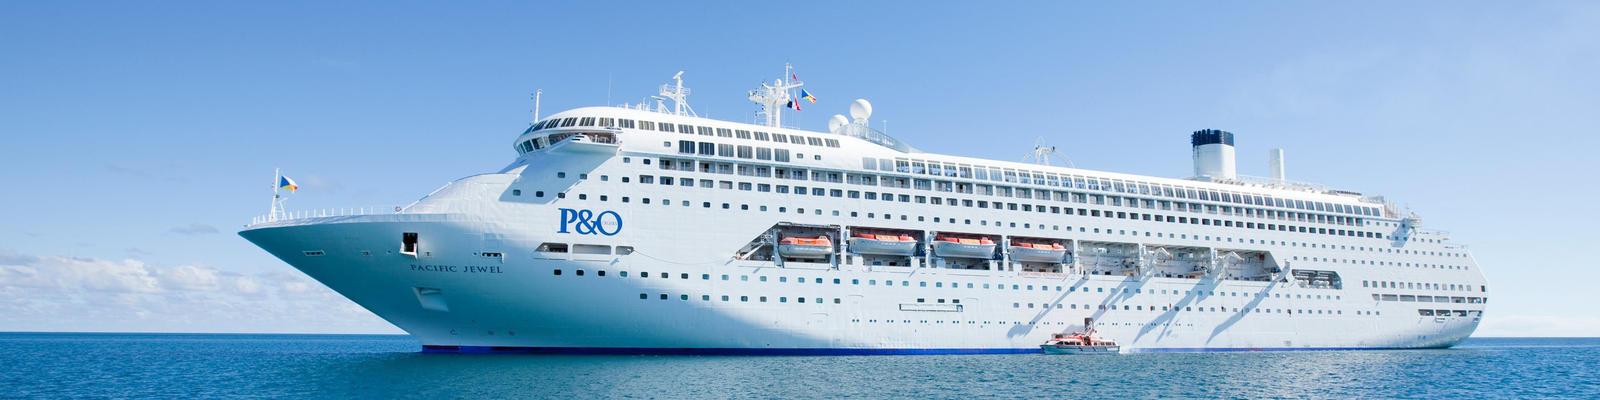 PO Australia Pacific Jewel Cruise Ship Review Photos - P and o cruises ships